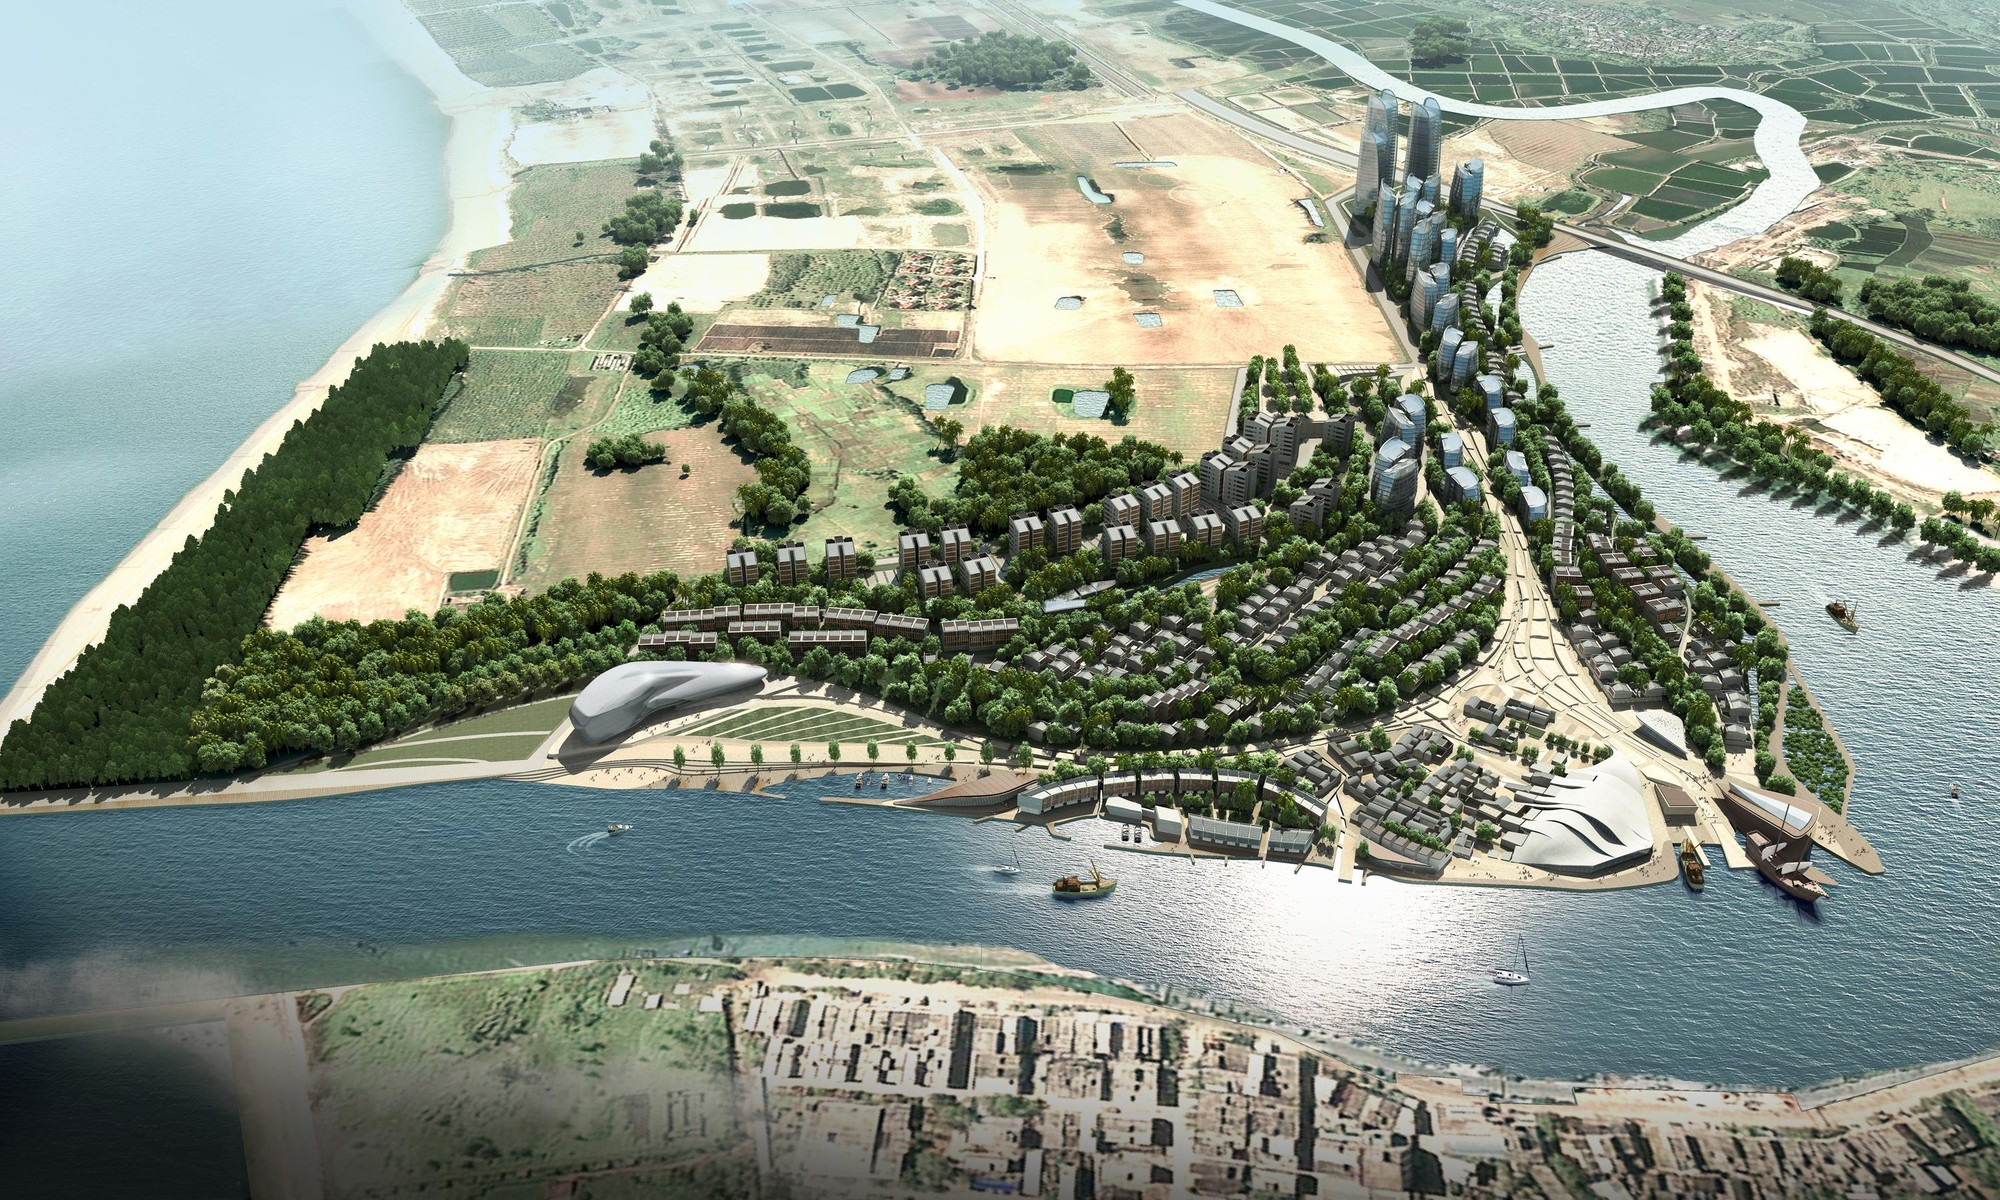 Propuesta Centro Cultural Oceanico Tanmen / Office for Architectural Culture, Cortesía de Office for Architectural Culture